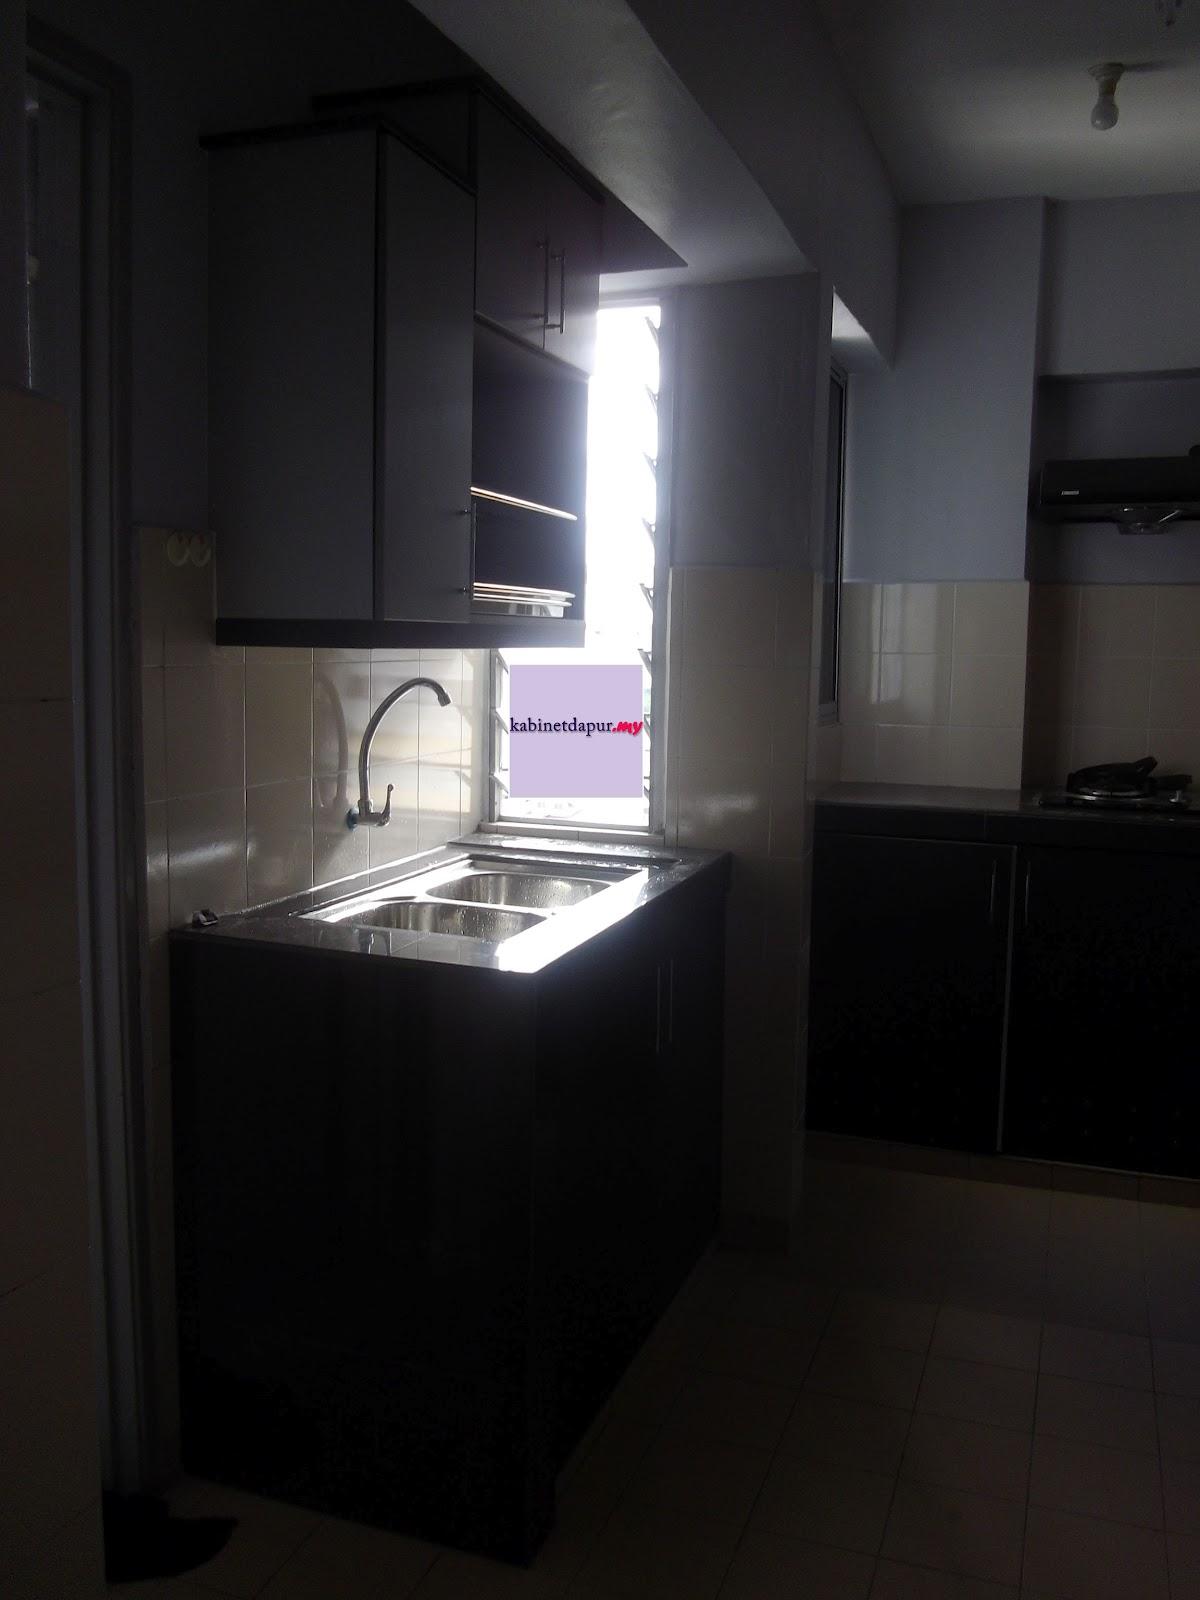 kabinet dapur  my Kabinet Dapur di Permata Fardeson